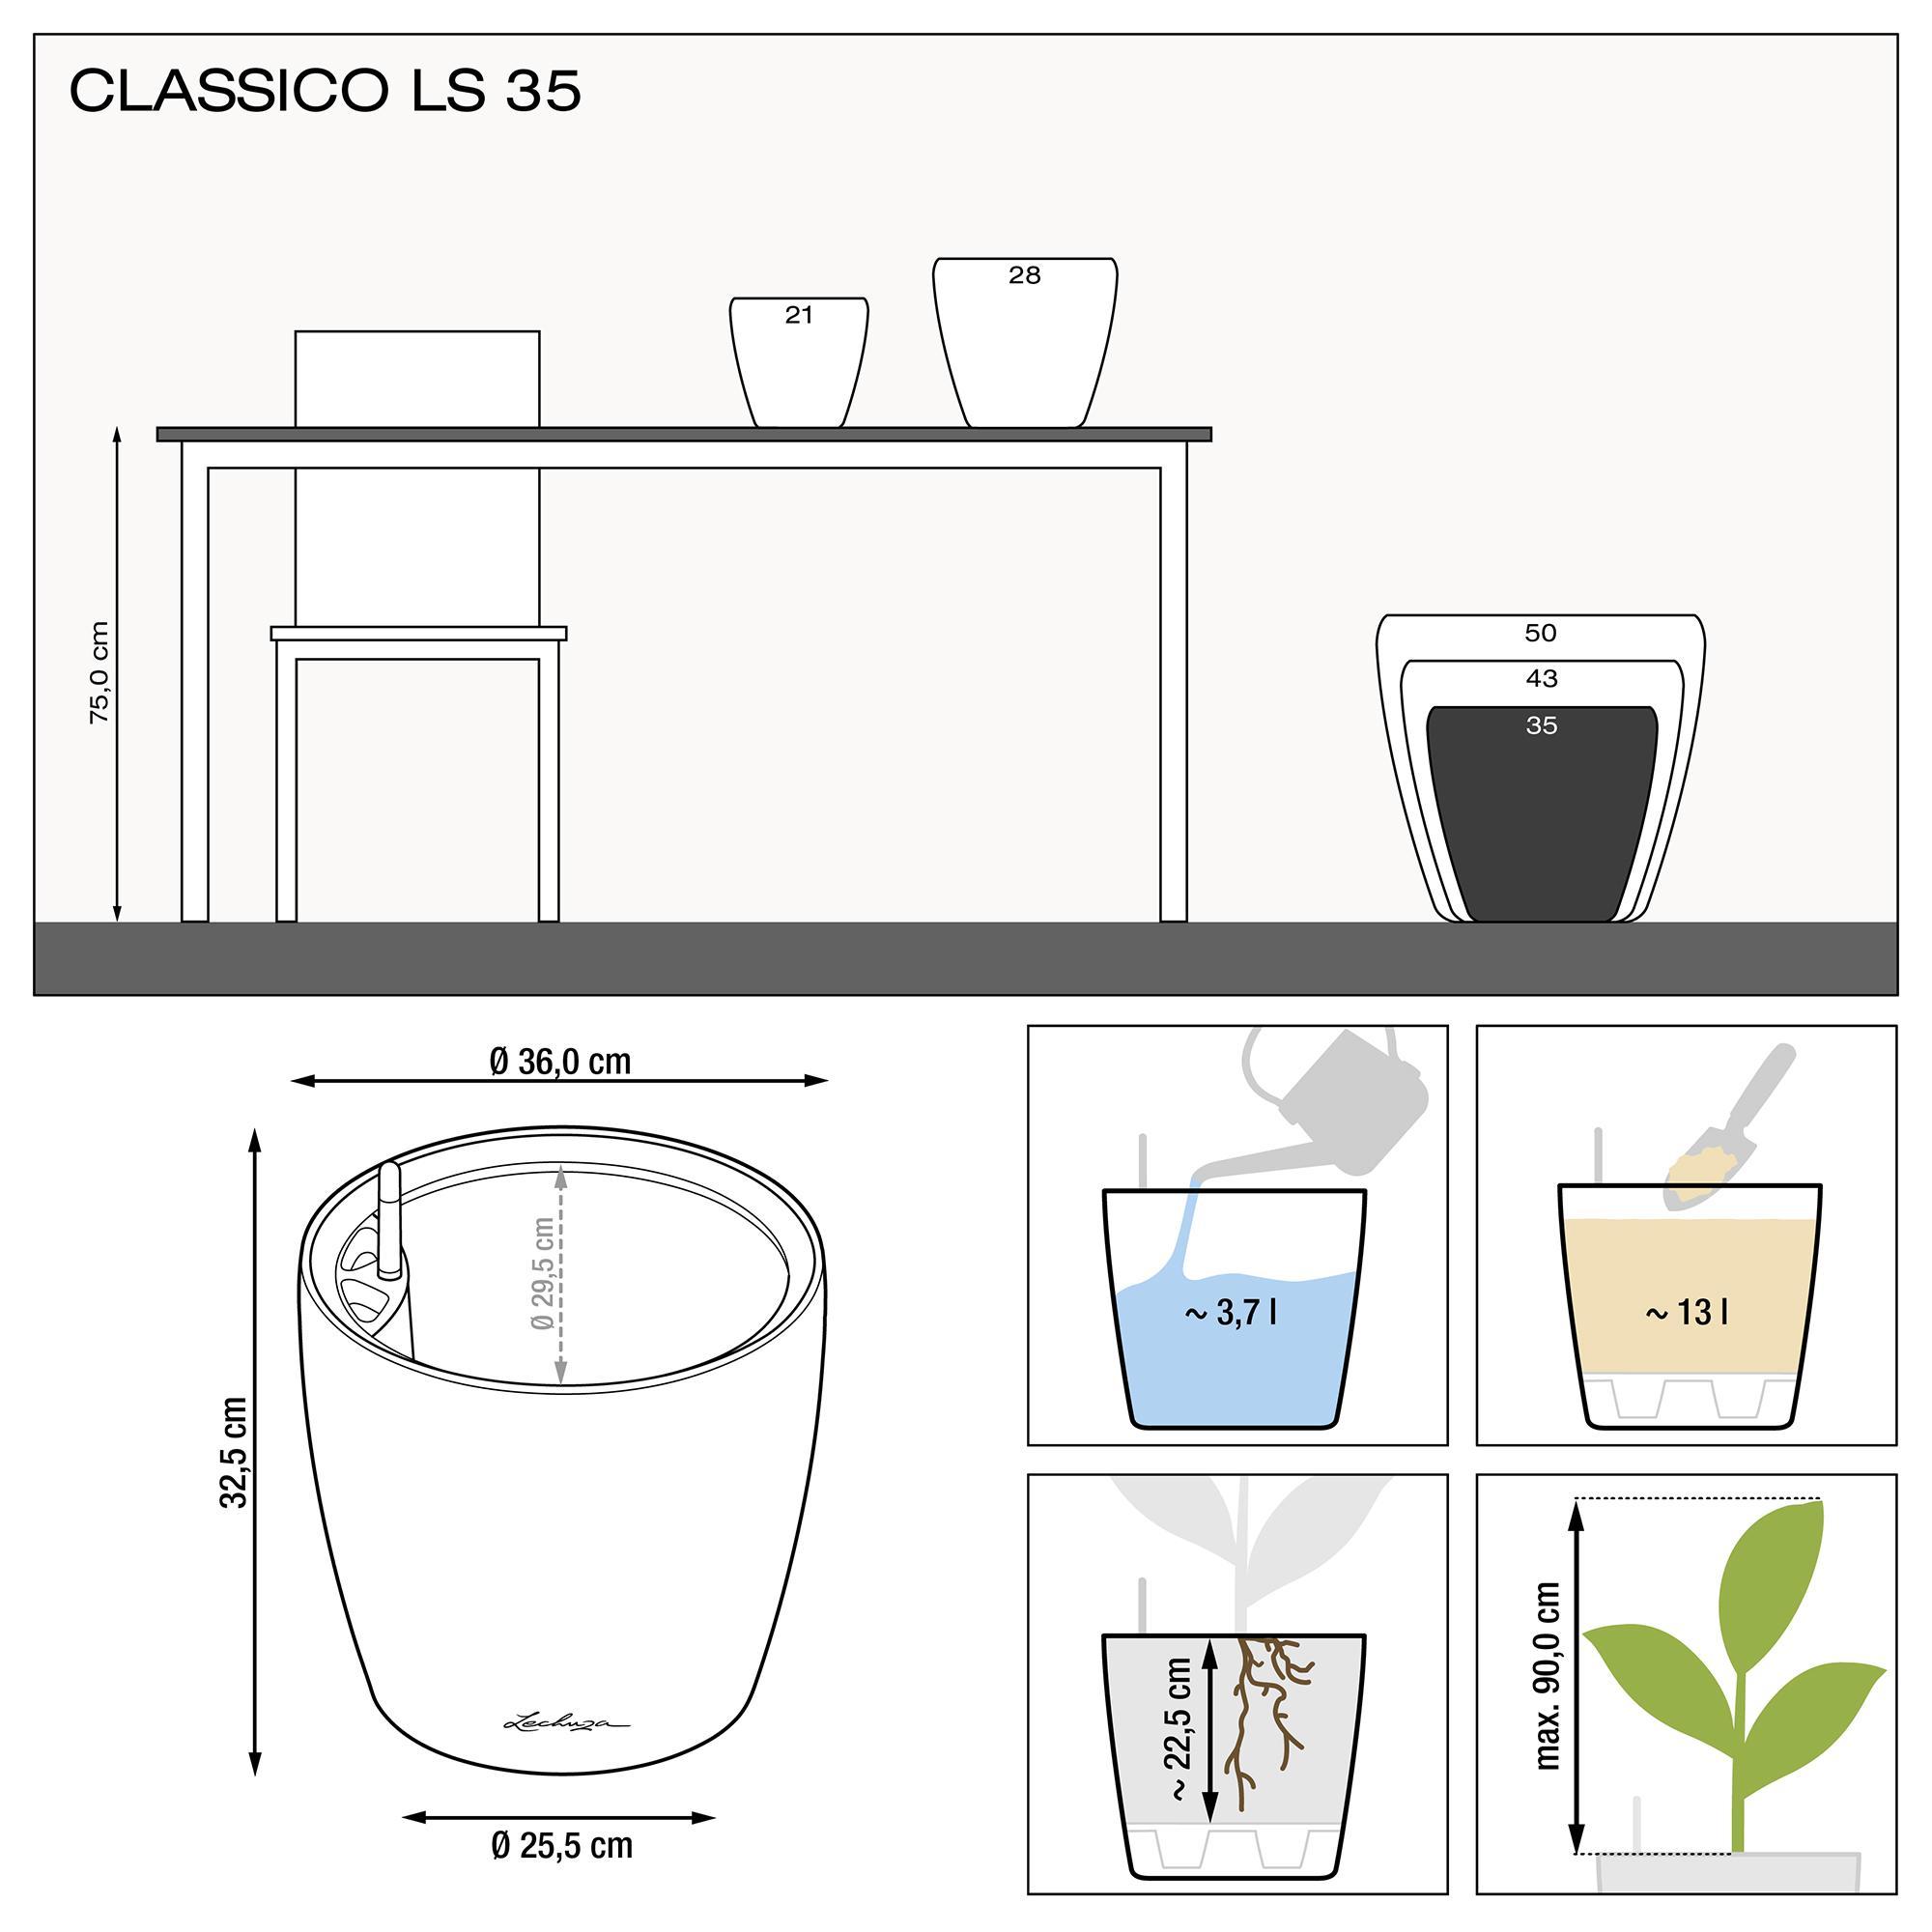 CLASSICO LS 35 black high-gloss - Image 3